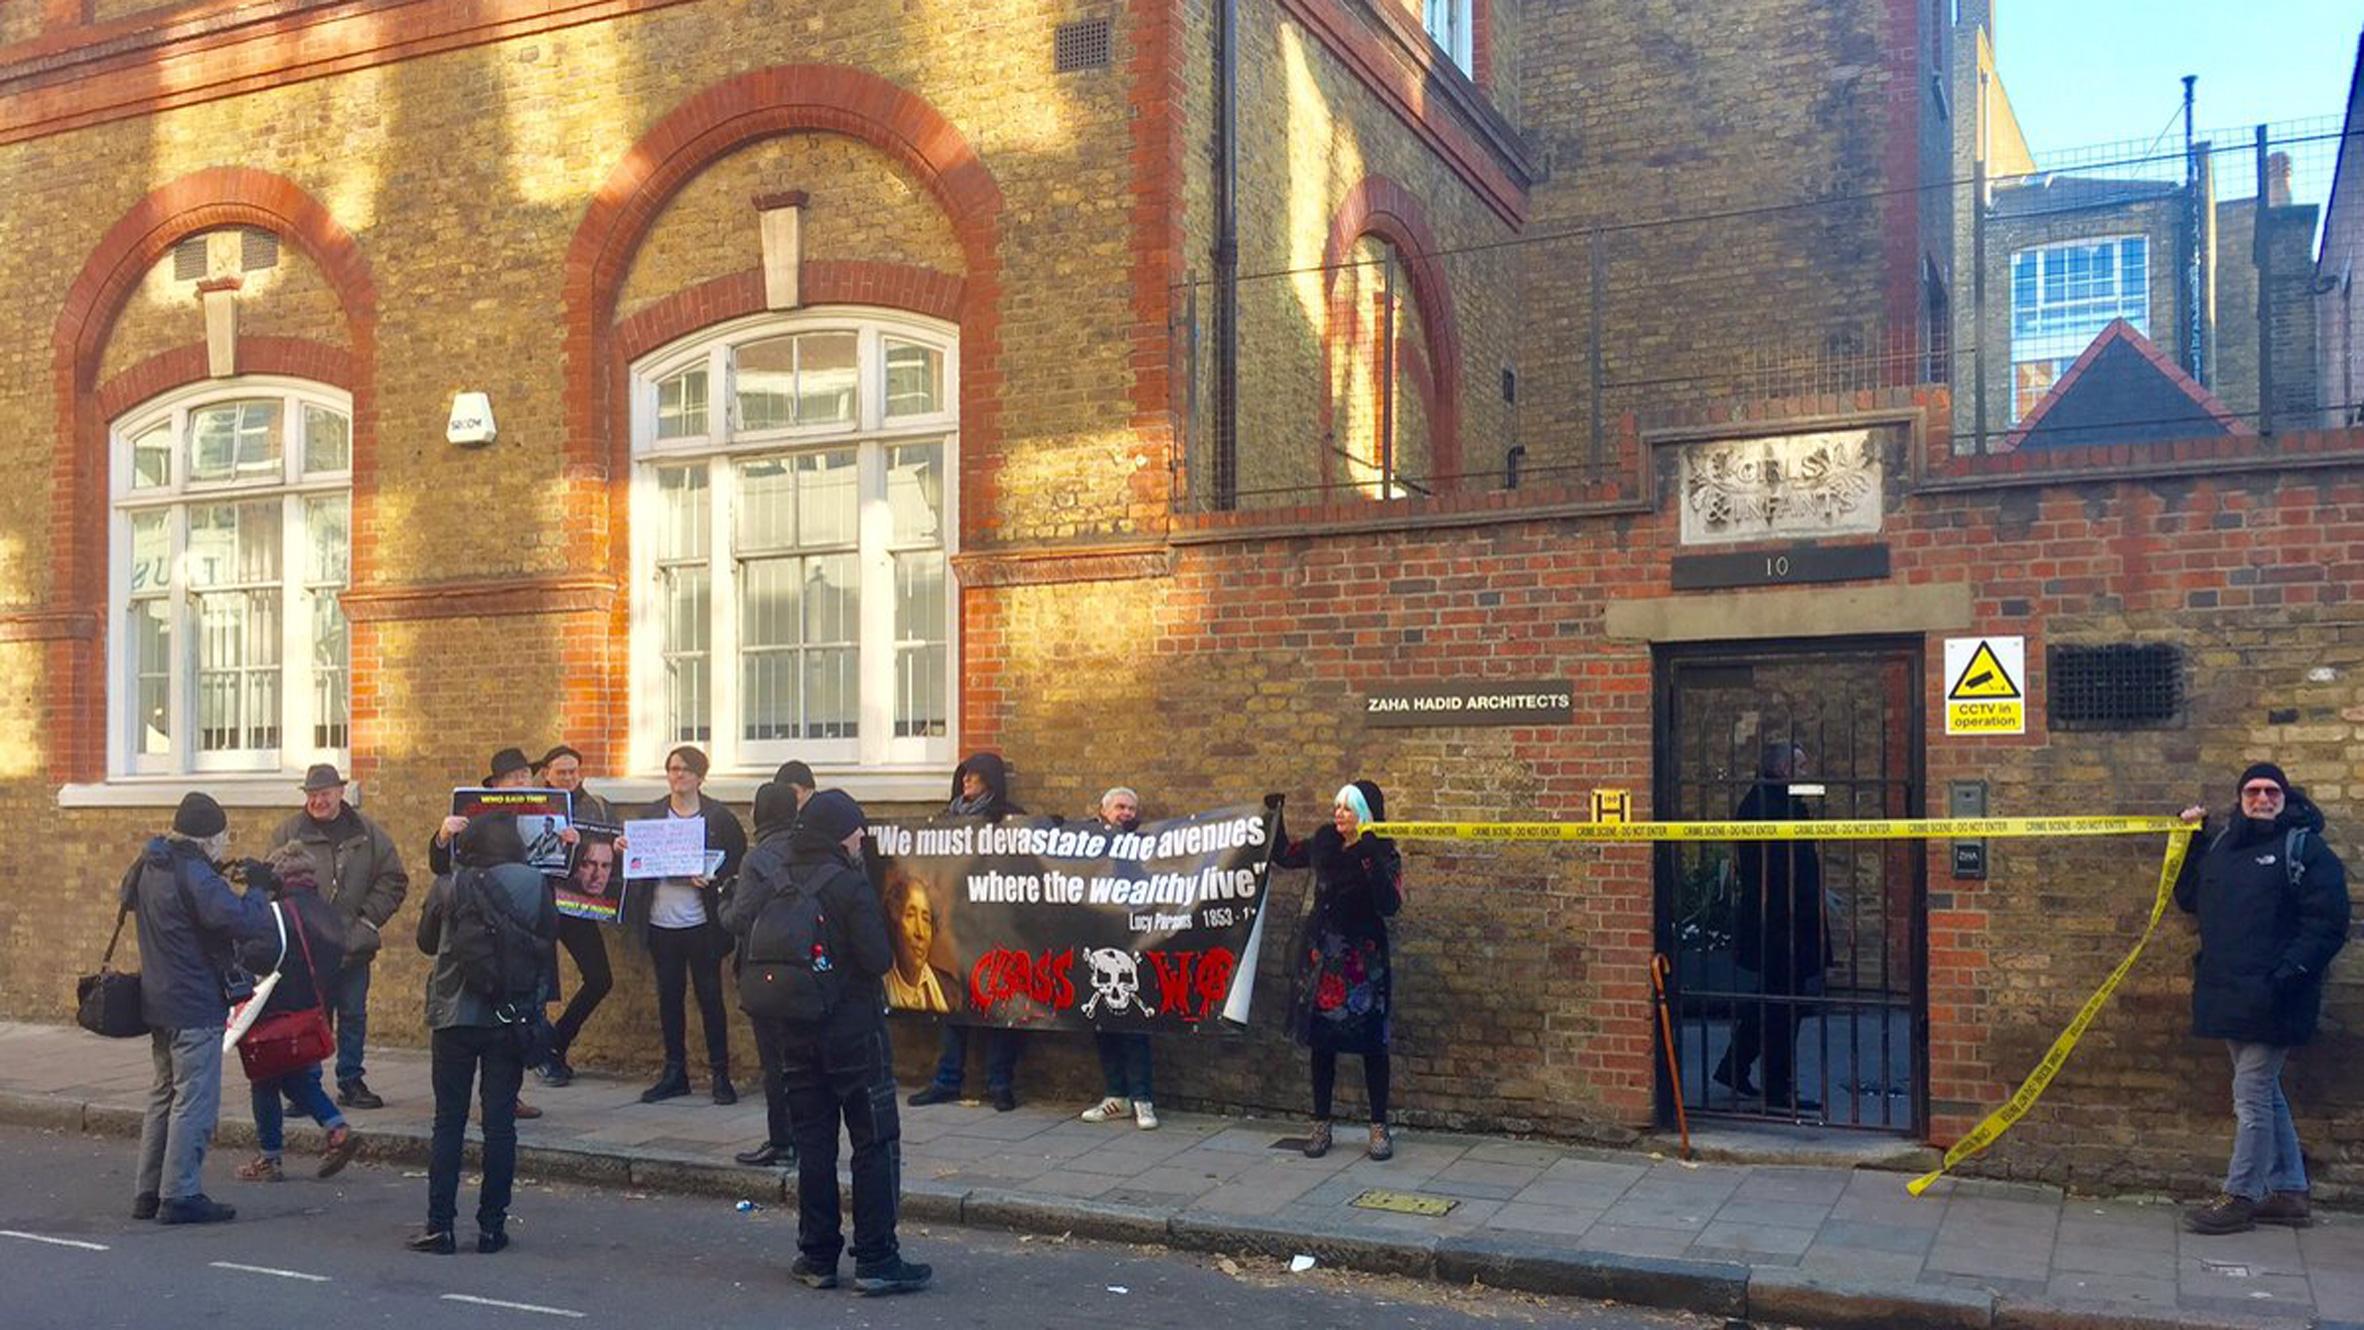 protest-campaign-zaha-hadid-architects-patrik-schumacher-hero